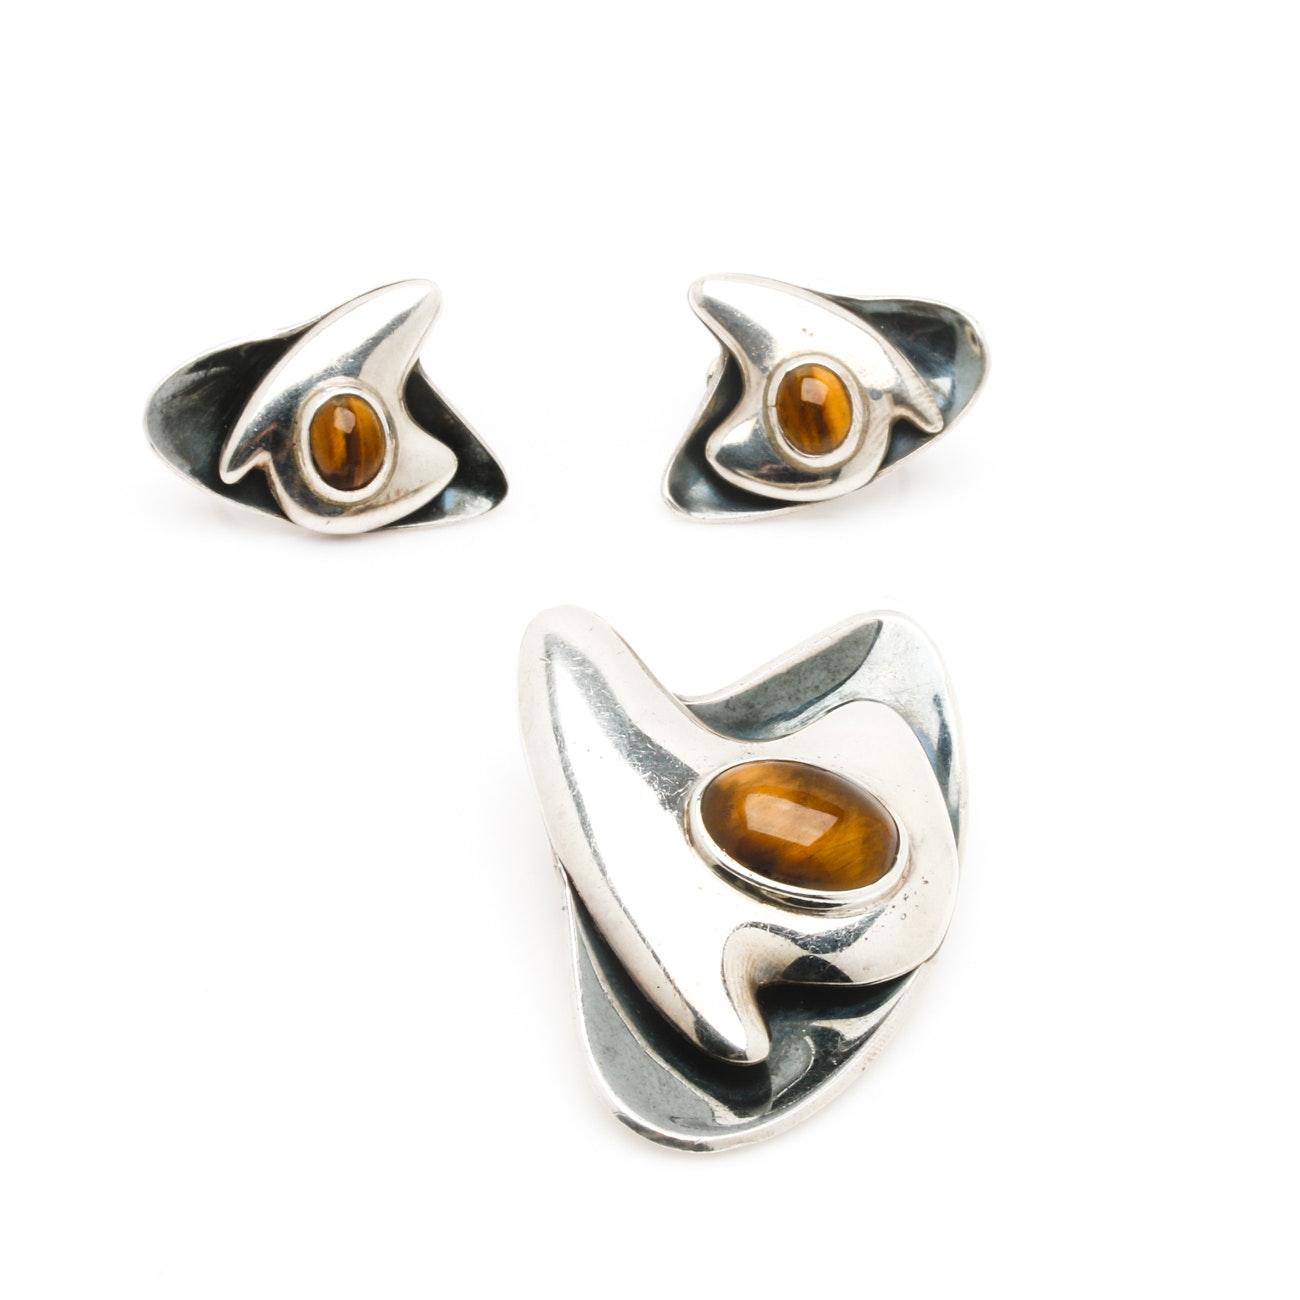 Modernist Sigi Pineda Sterling Silver Tiger's Eye Earrings and Brooch